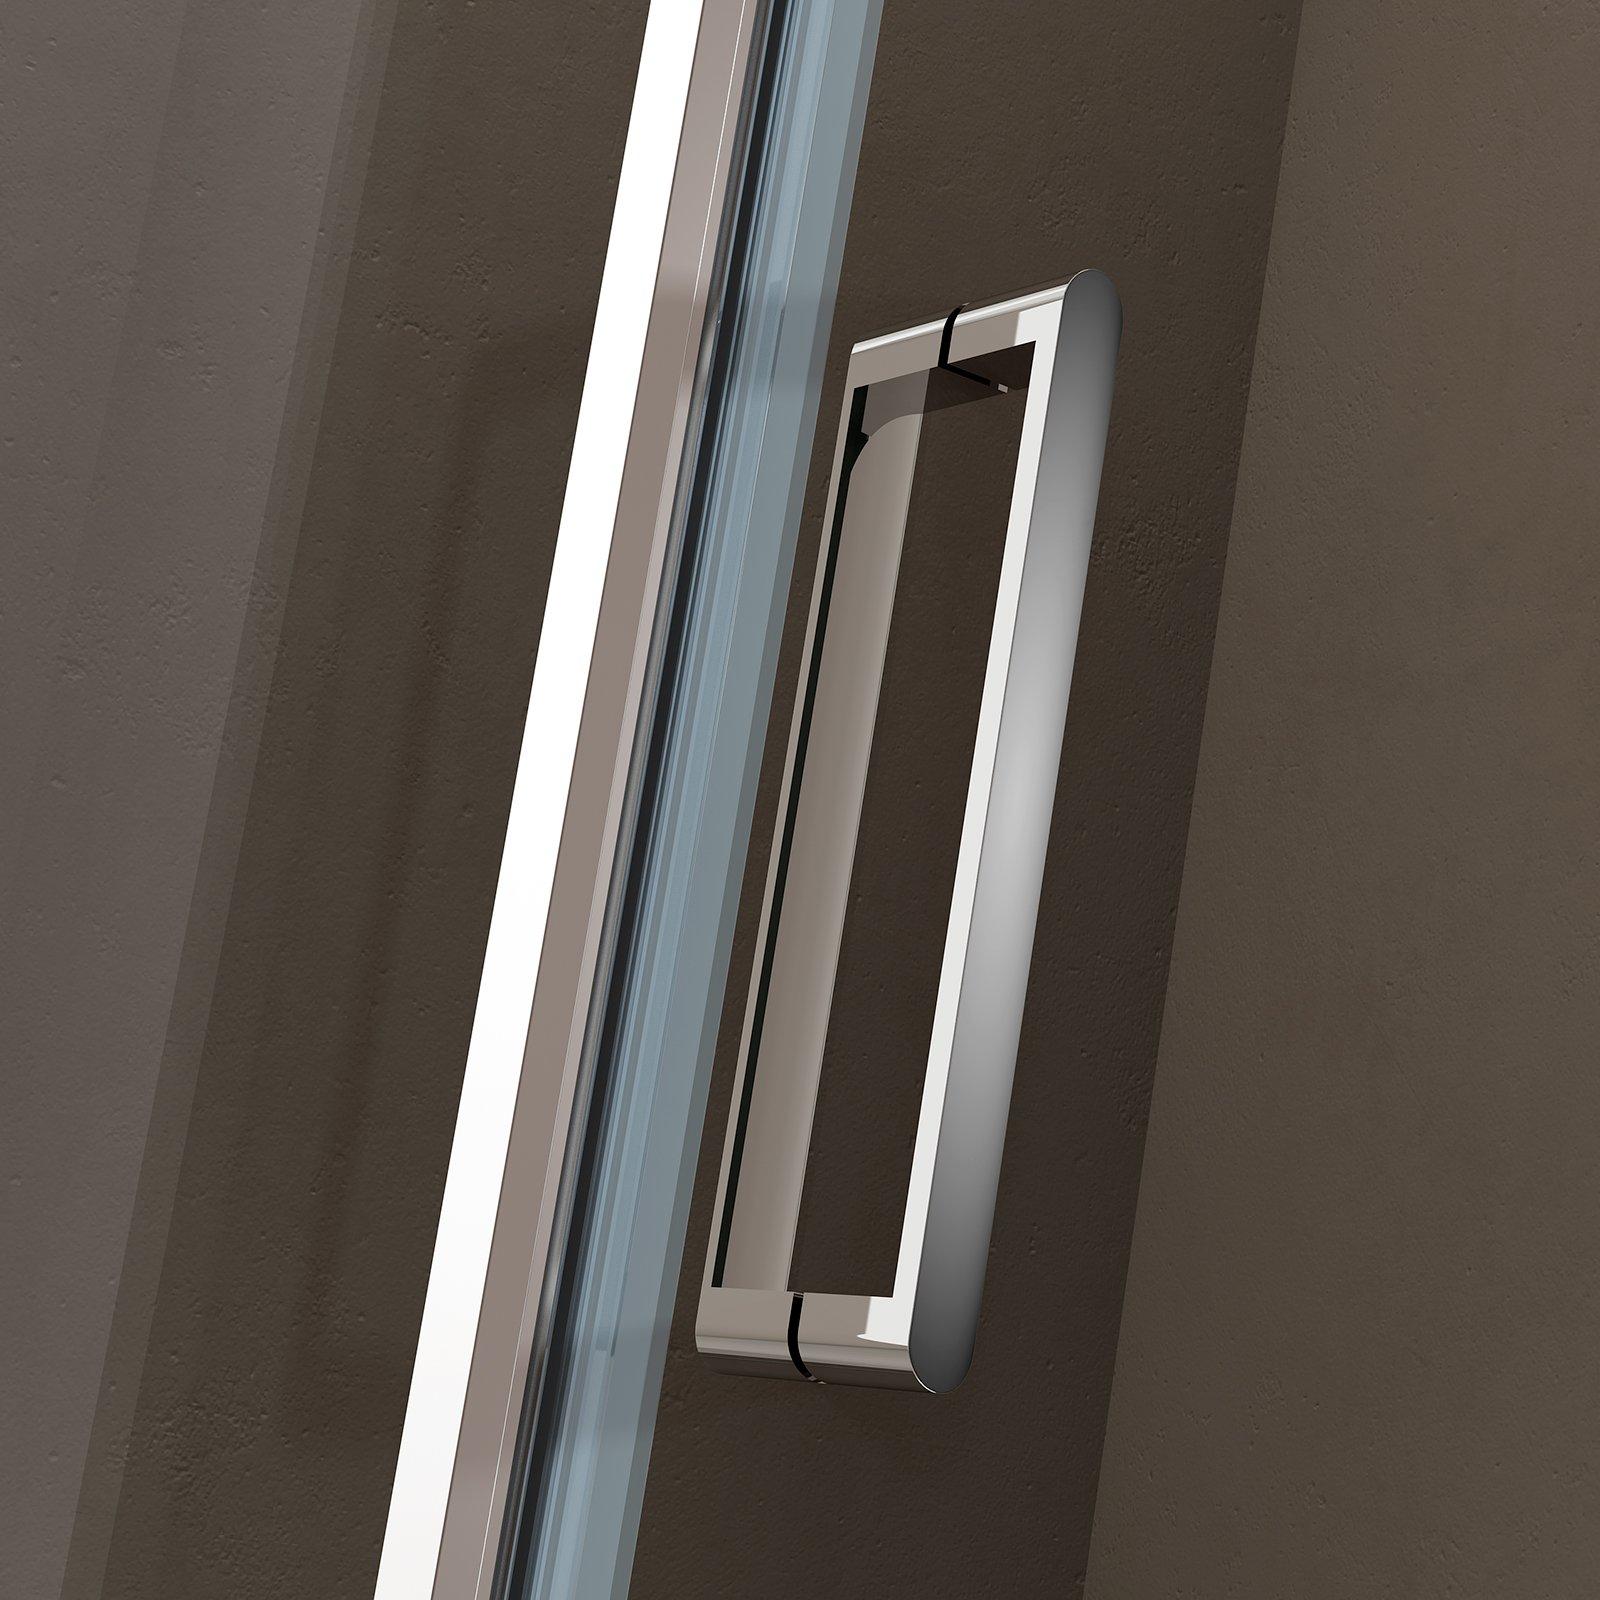 Duschkabine Eckdusche Nano 6mm Echtglas EX416S - 100 x 100 x 195 cm zoom thumbnail 4